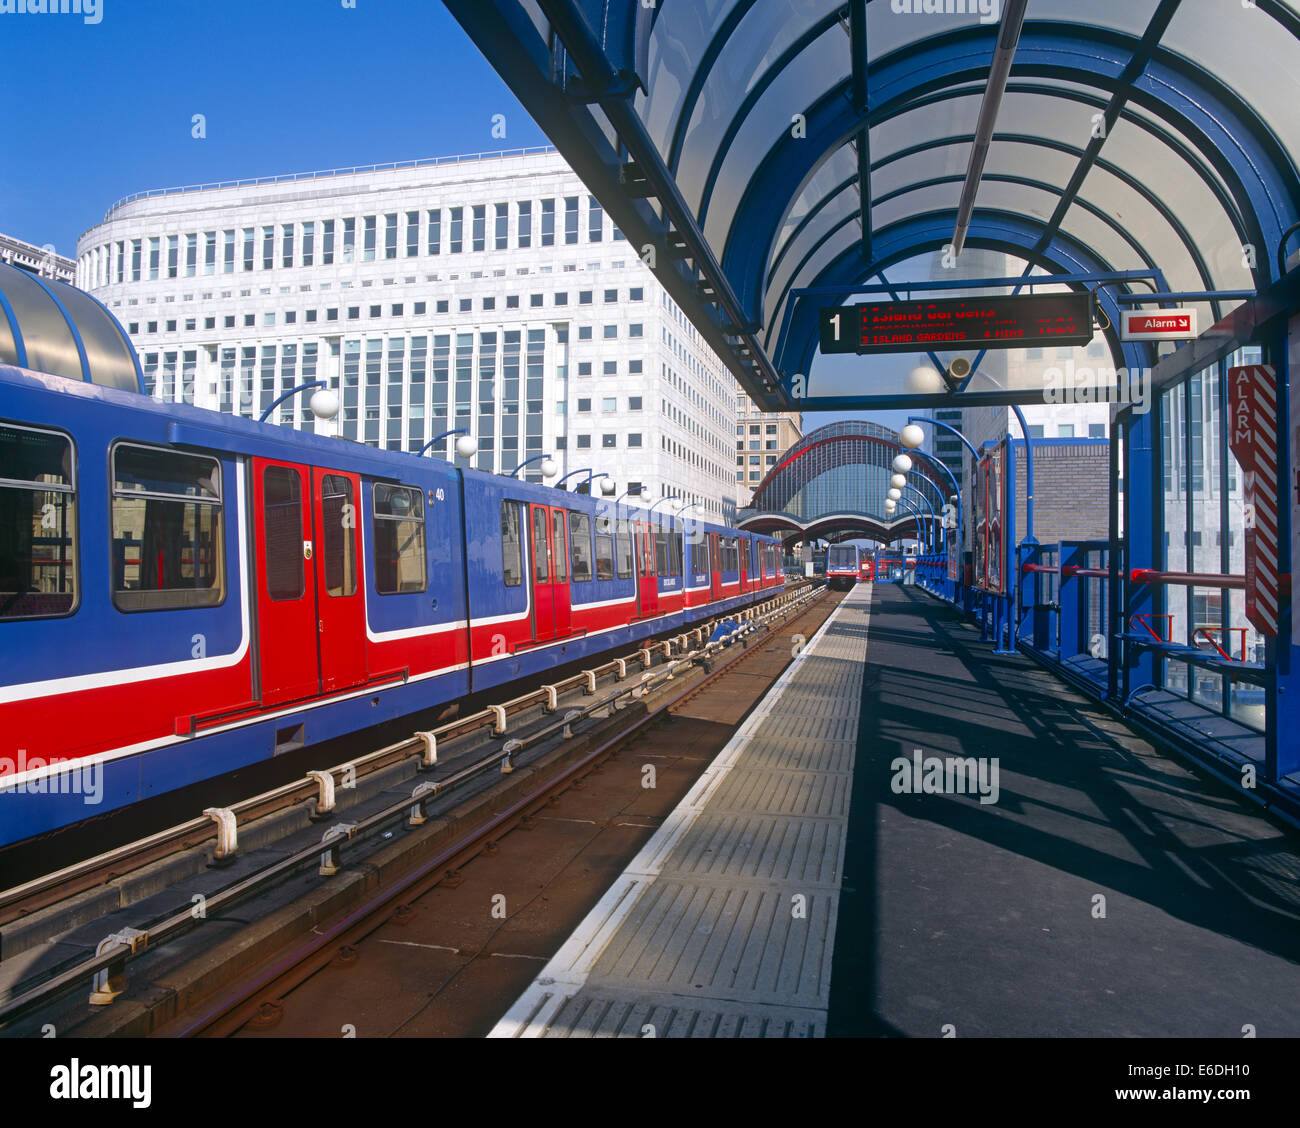 Heron Quay station Docklands light railway London UK - Stock Image